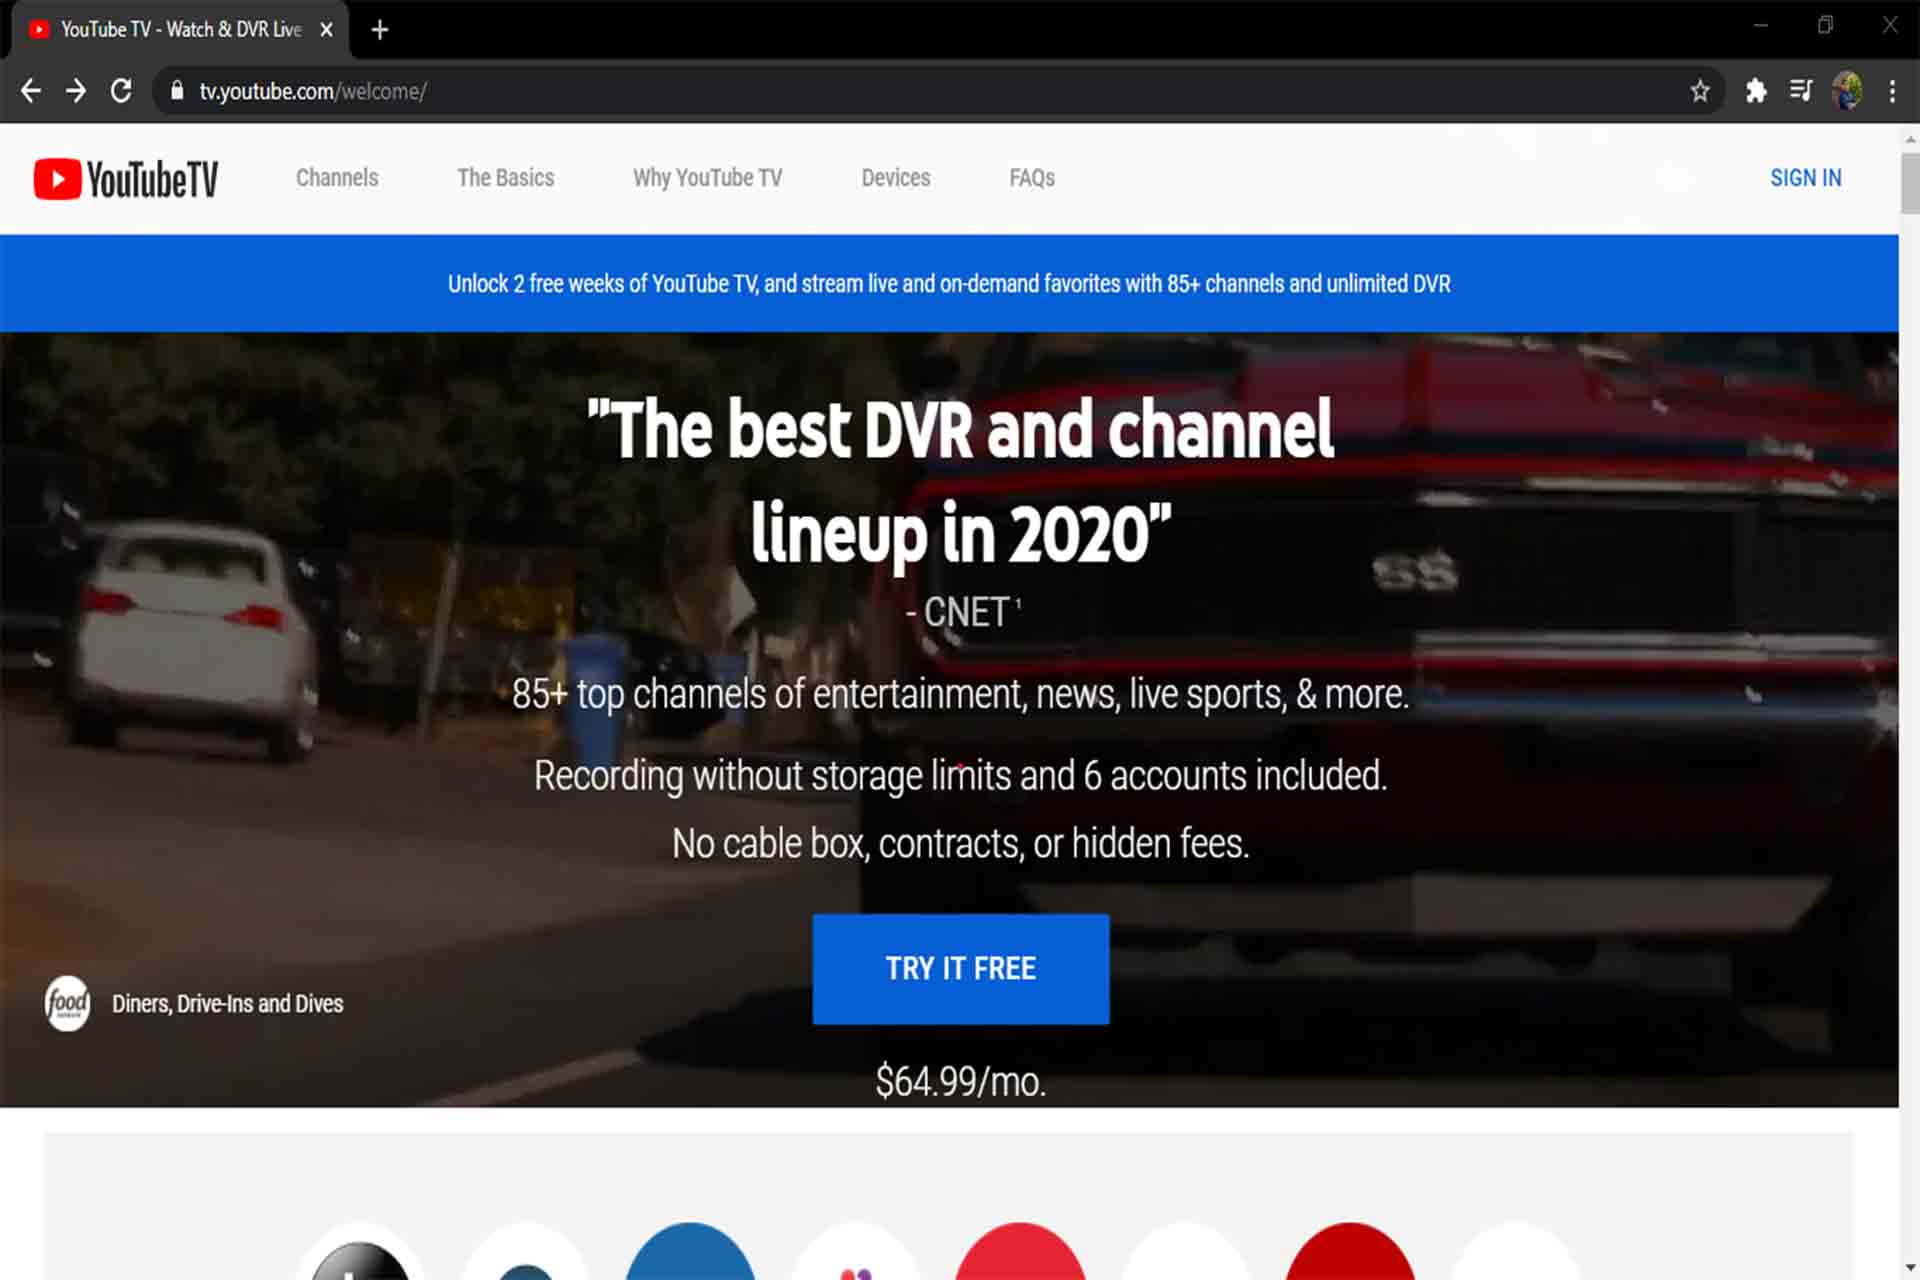 youtube Tv home screen